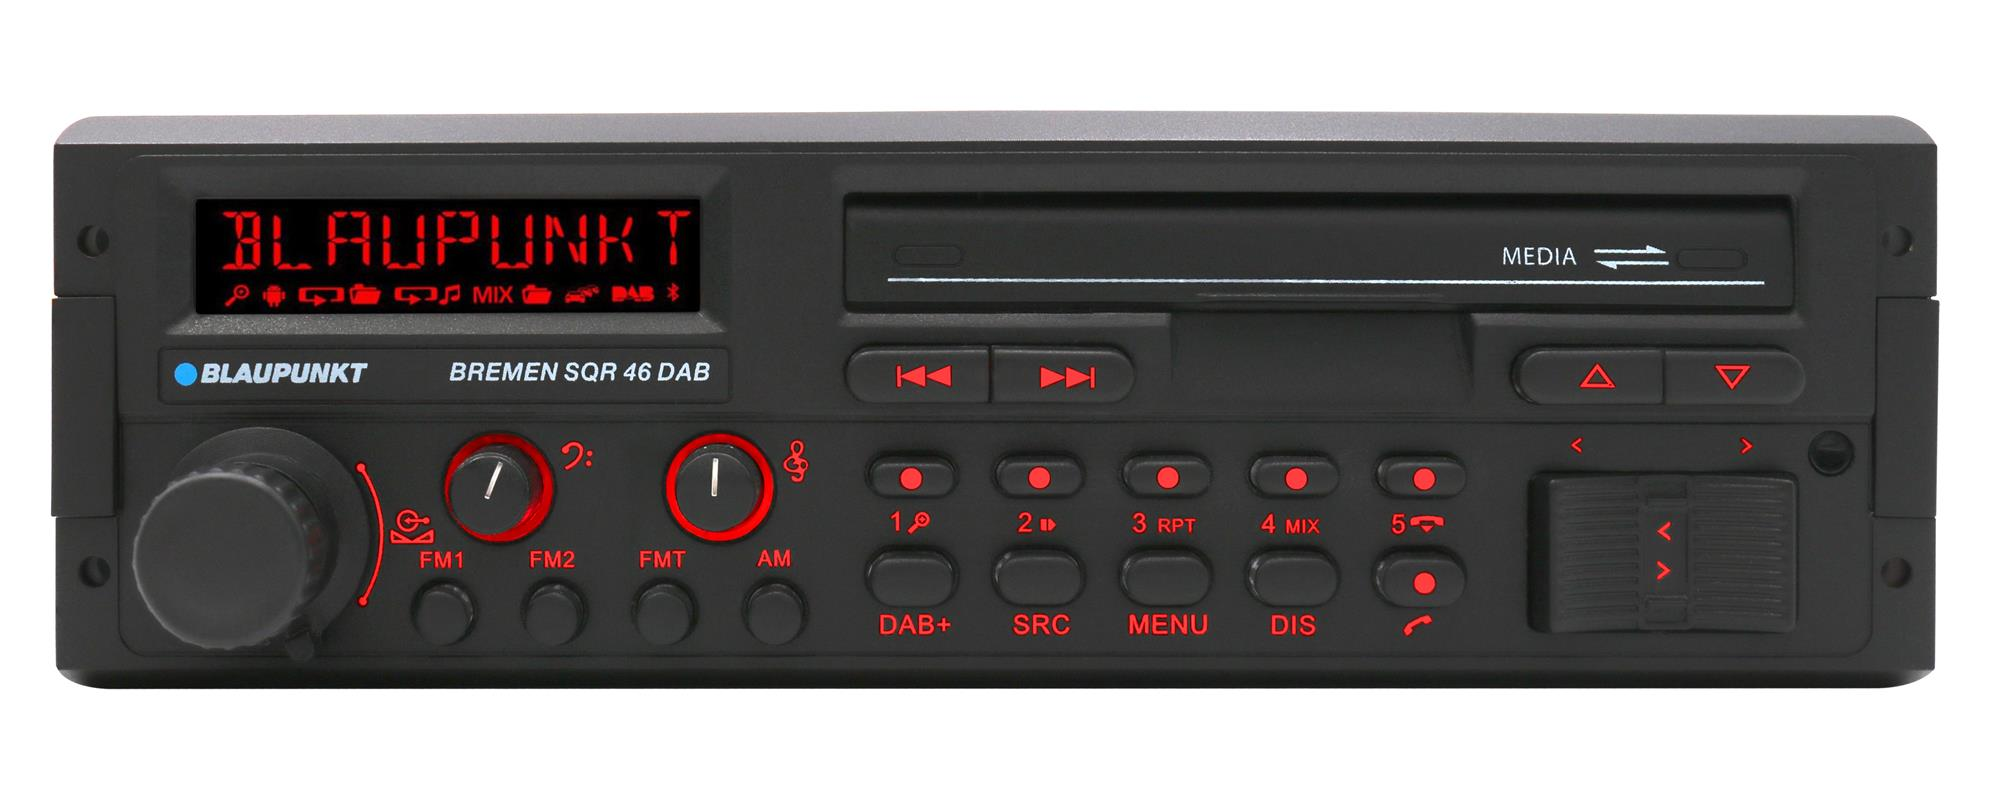 Blaupunkt Bremen SQR 46 DAB Retro radio